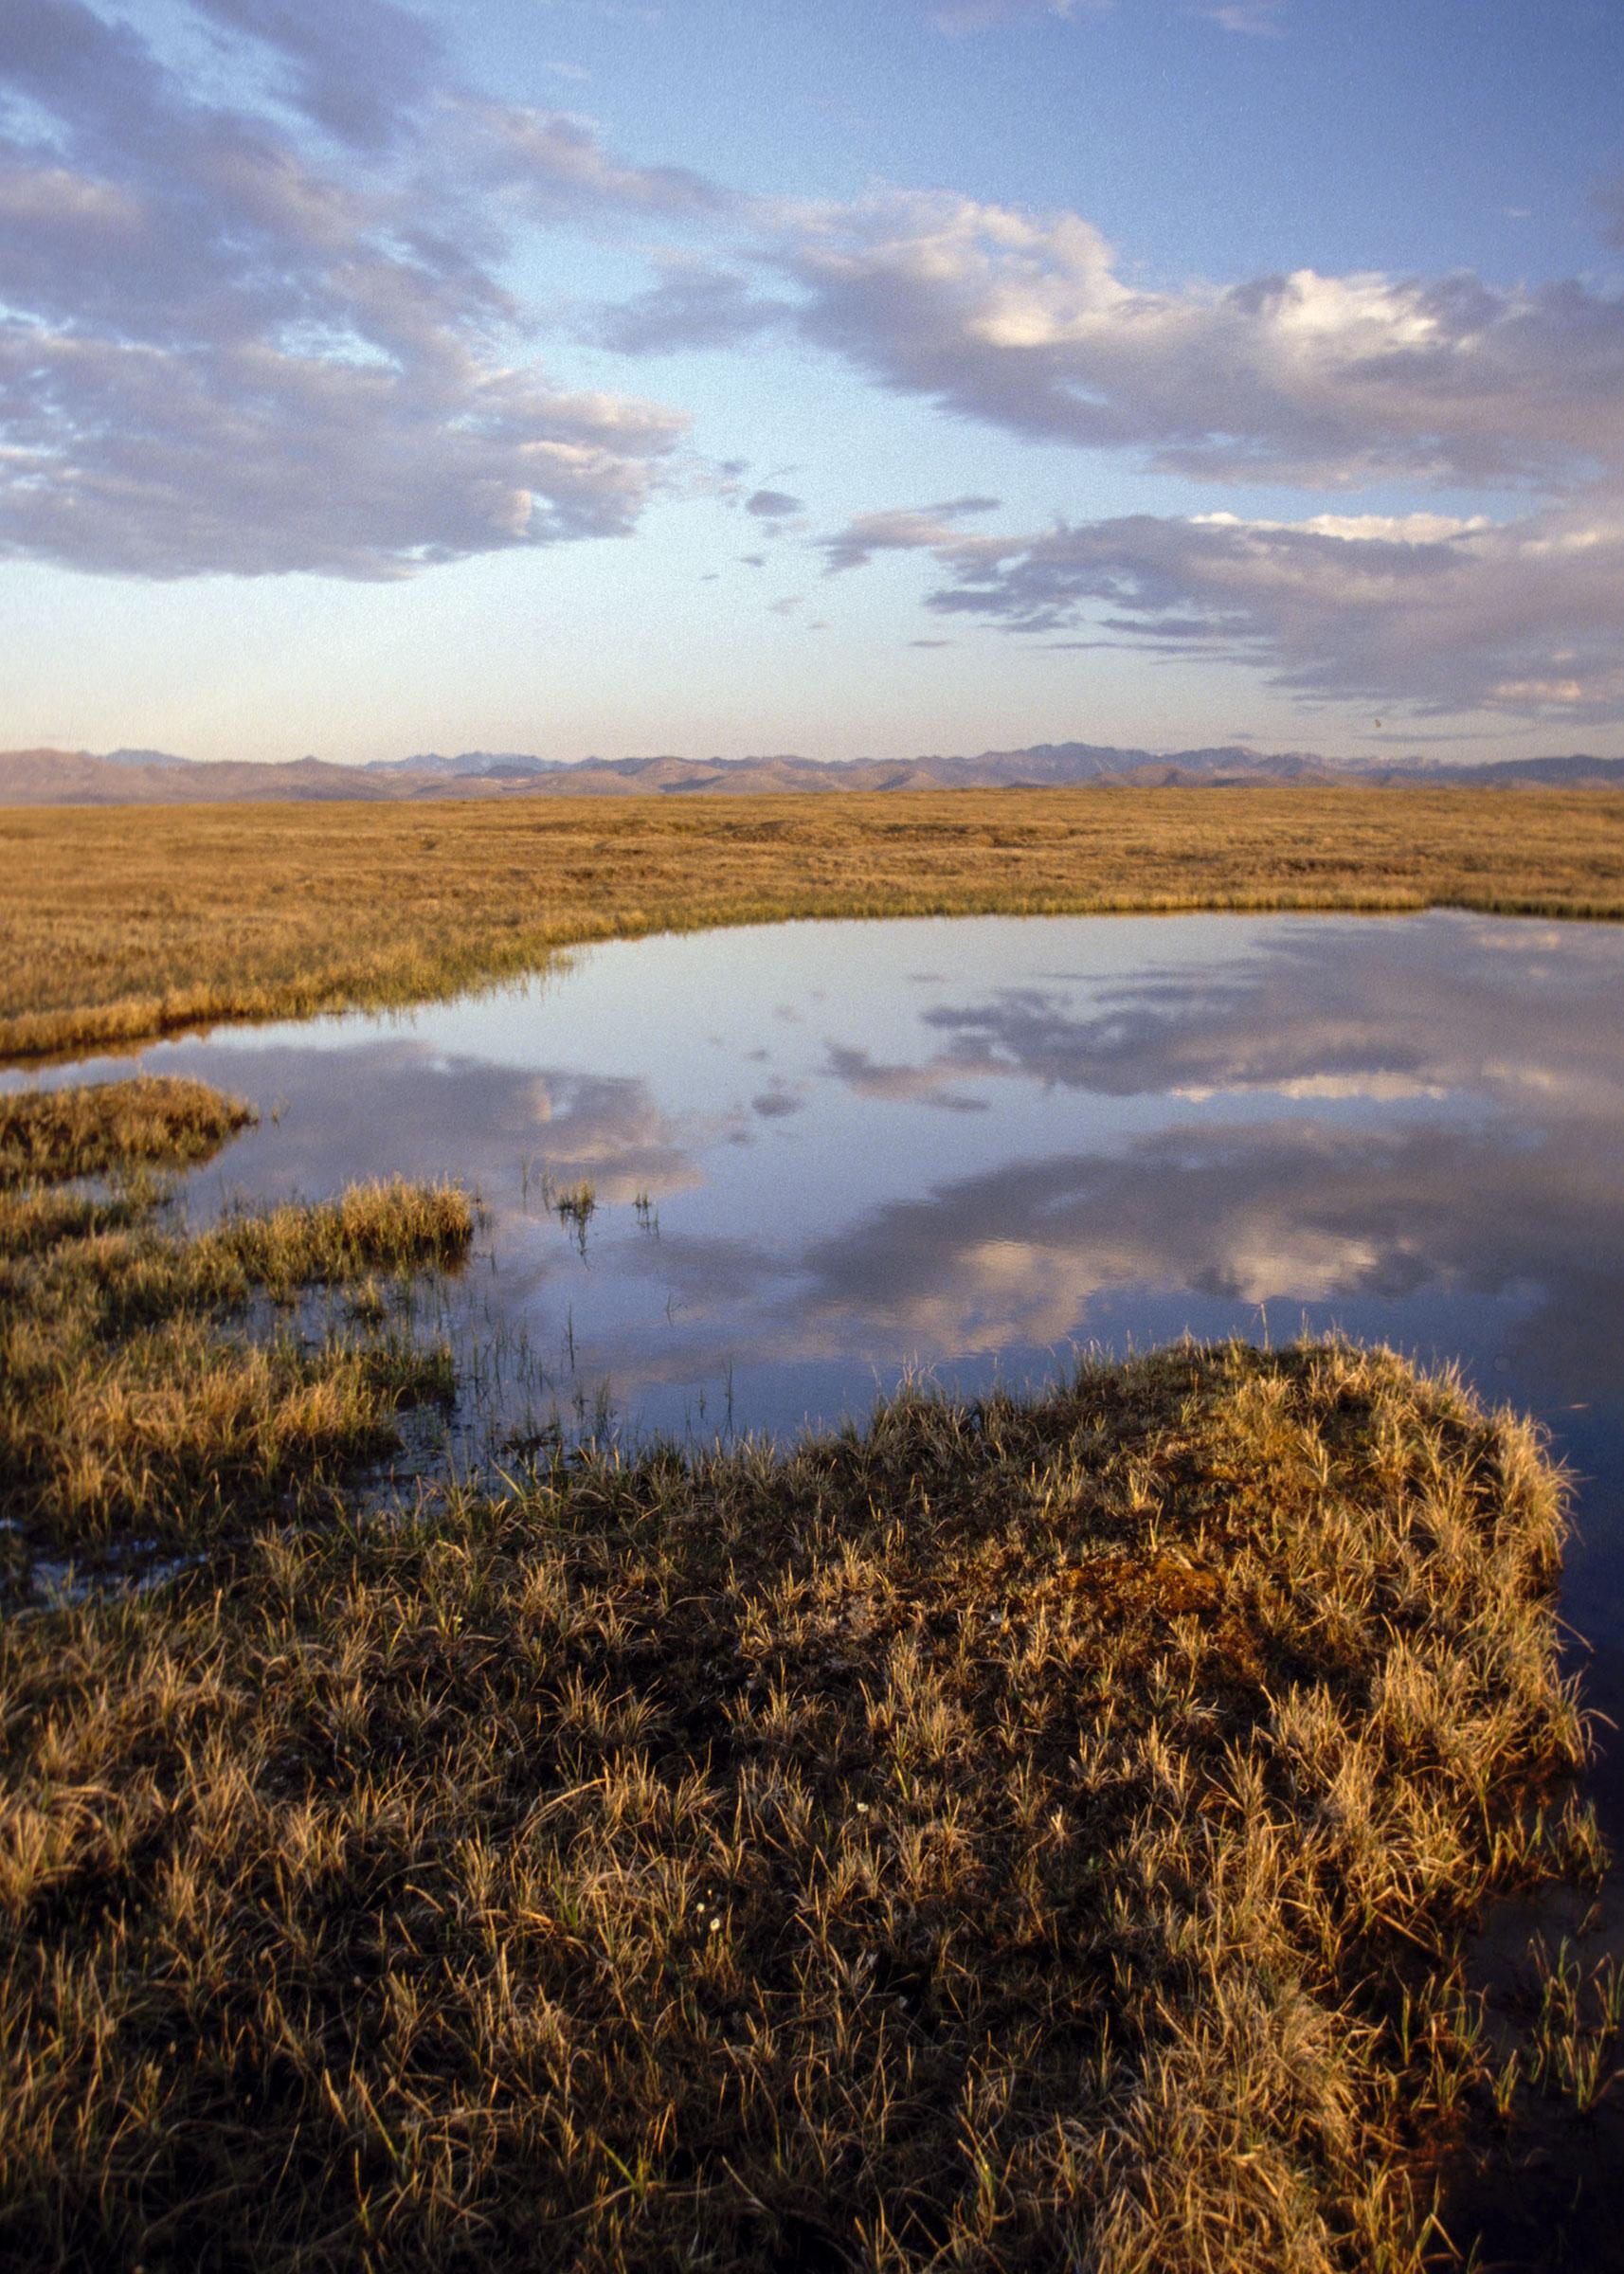 Arctic National Wildlife Refuge coastal plain. Karen Jettmar/Alamy